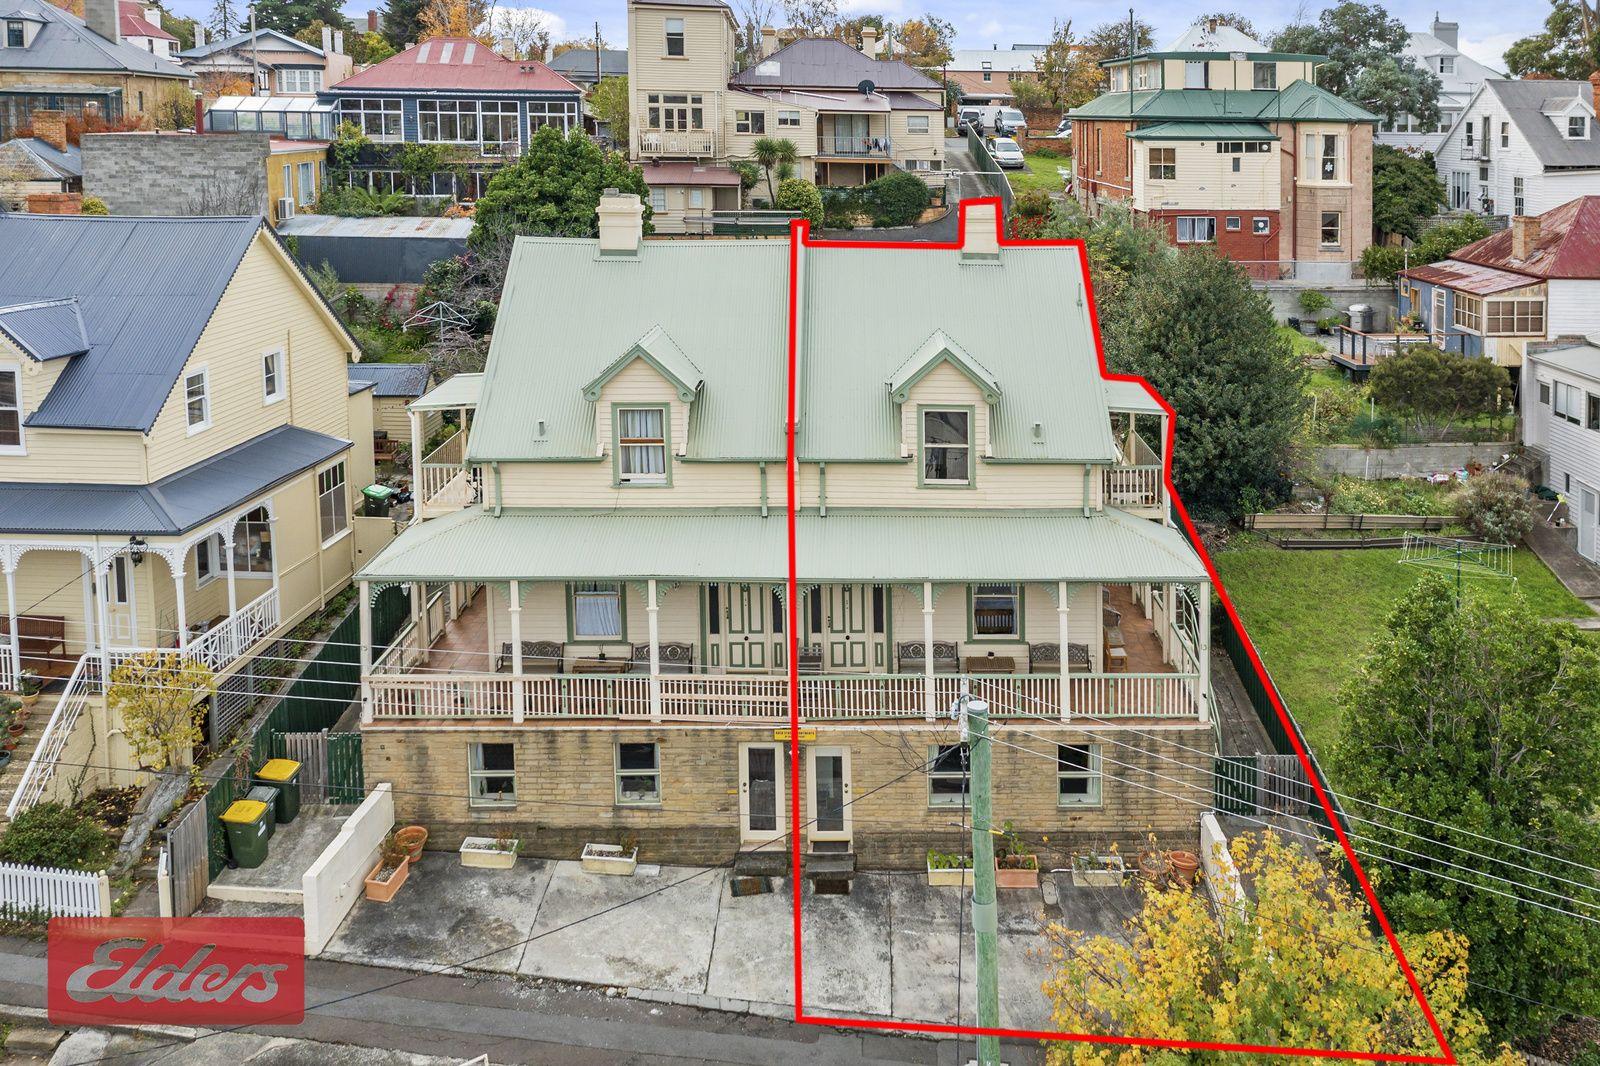 3 bedrooms House in U1, 13 - 15 Bath Street BATTERY POINT TAS, 7004